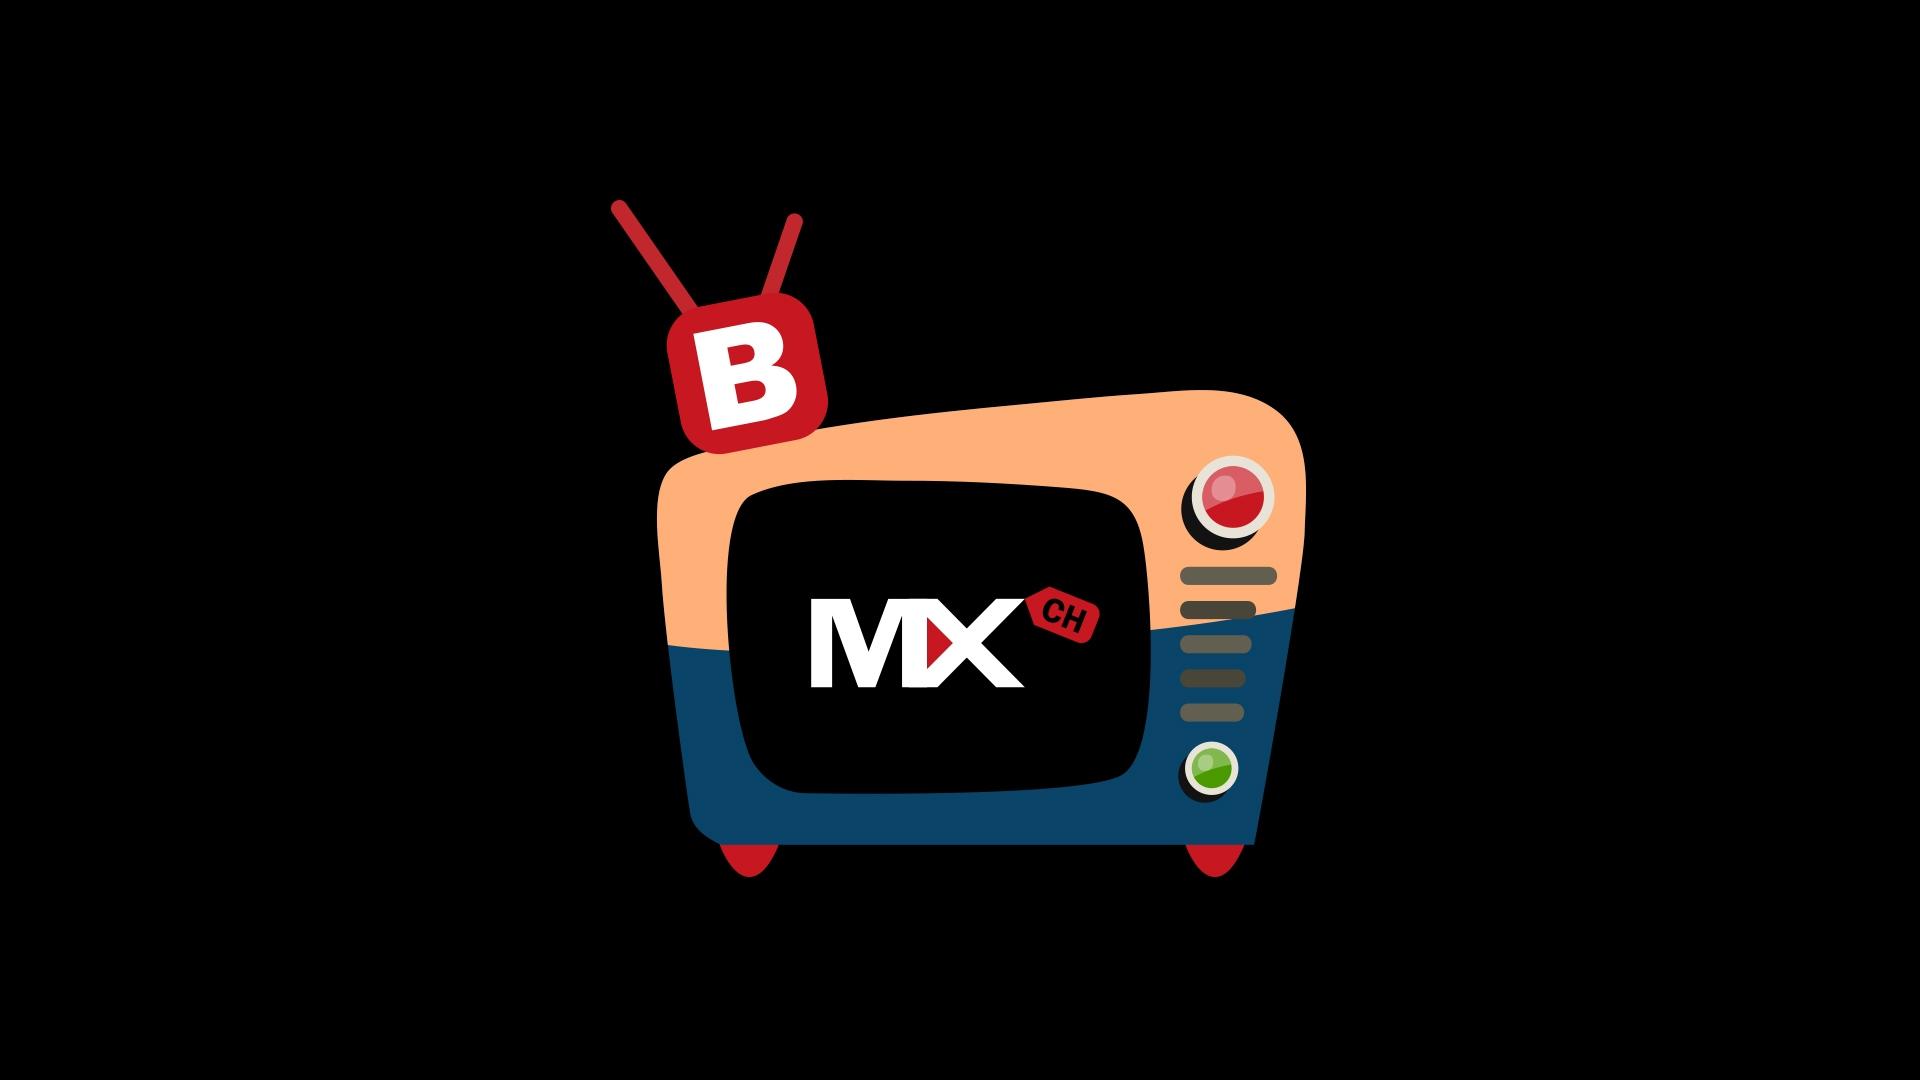 [CH.MX][B] EP.7 HW & I.M Date